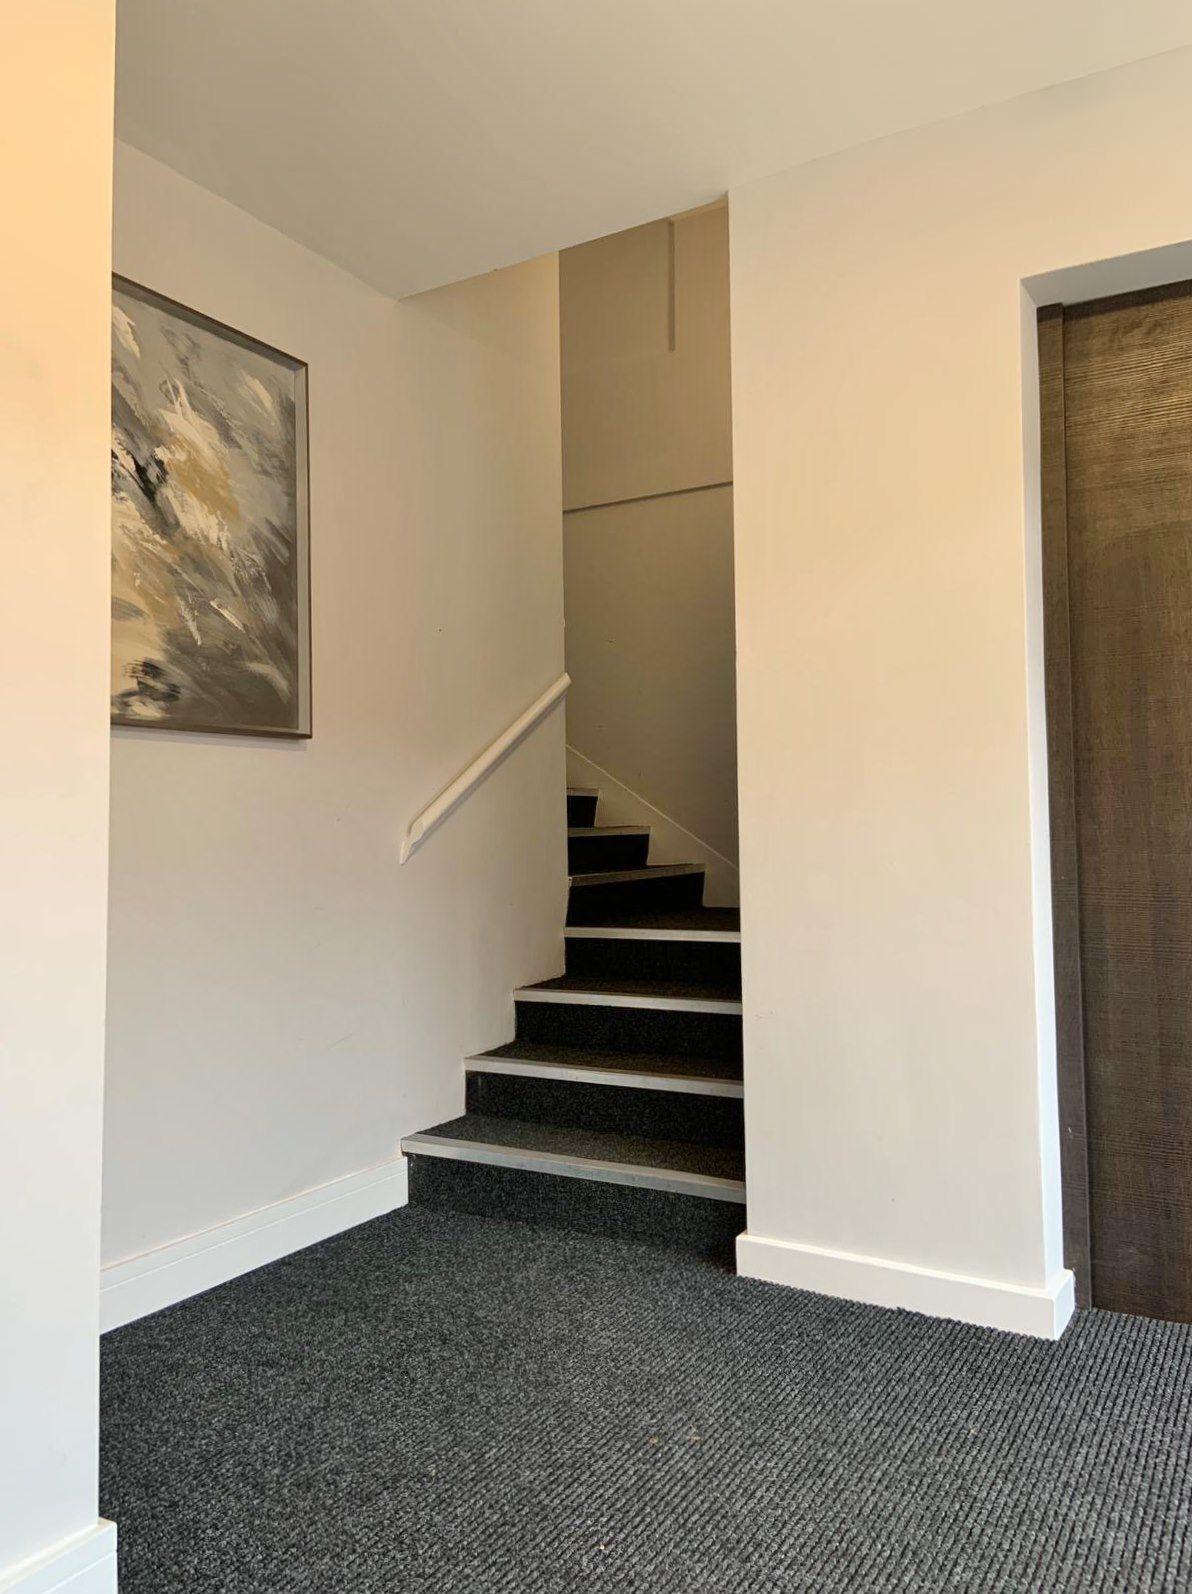 1 bedroom flat flat/apartment To Let in Kingsbury - Communal staircase